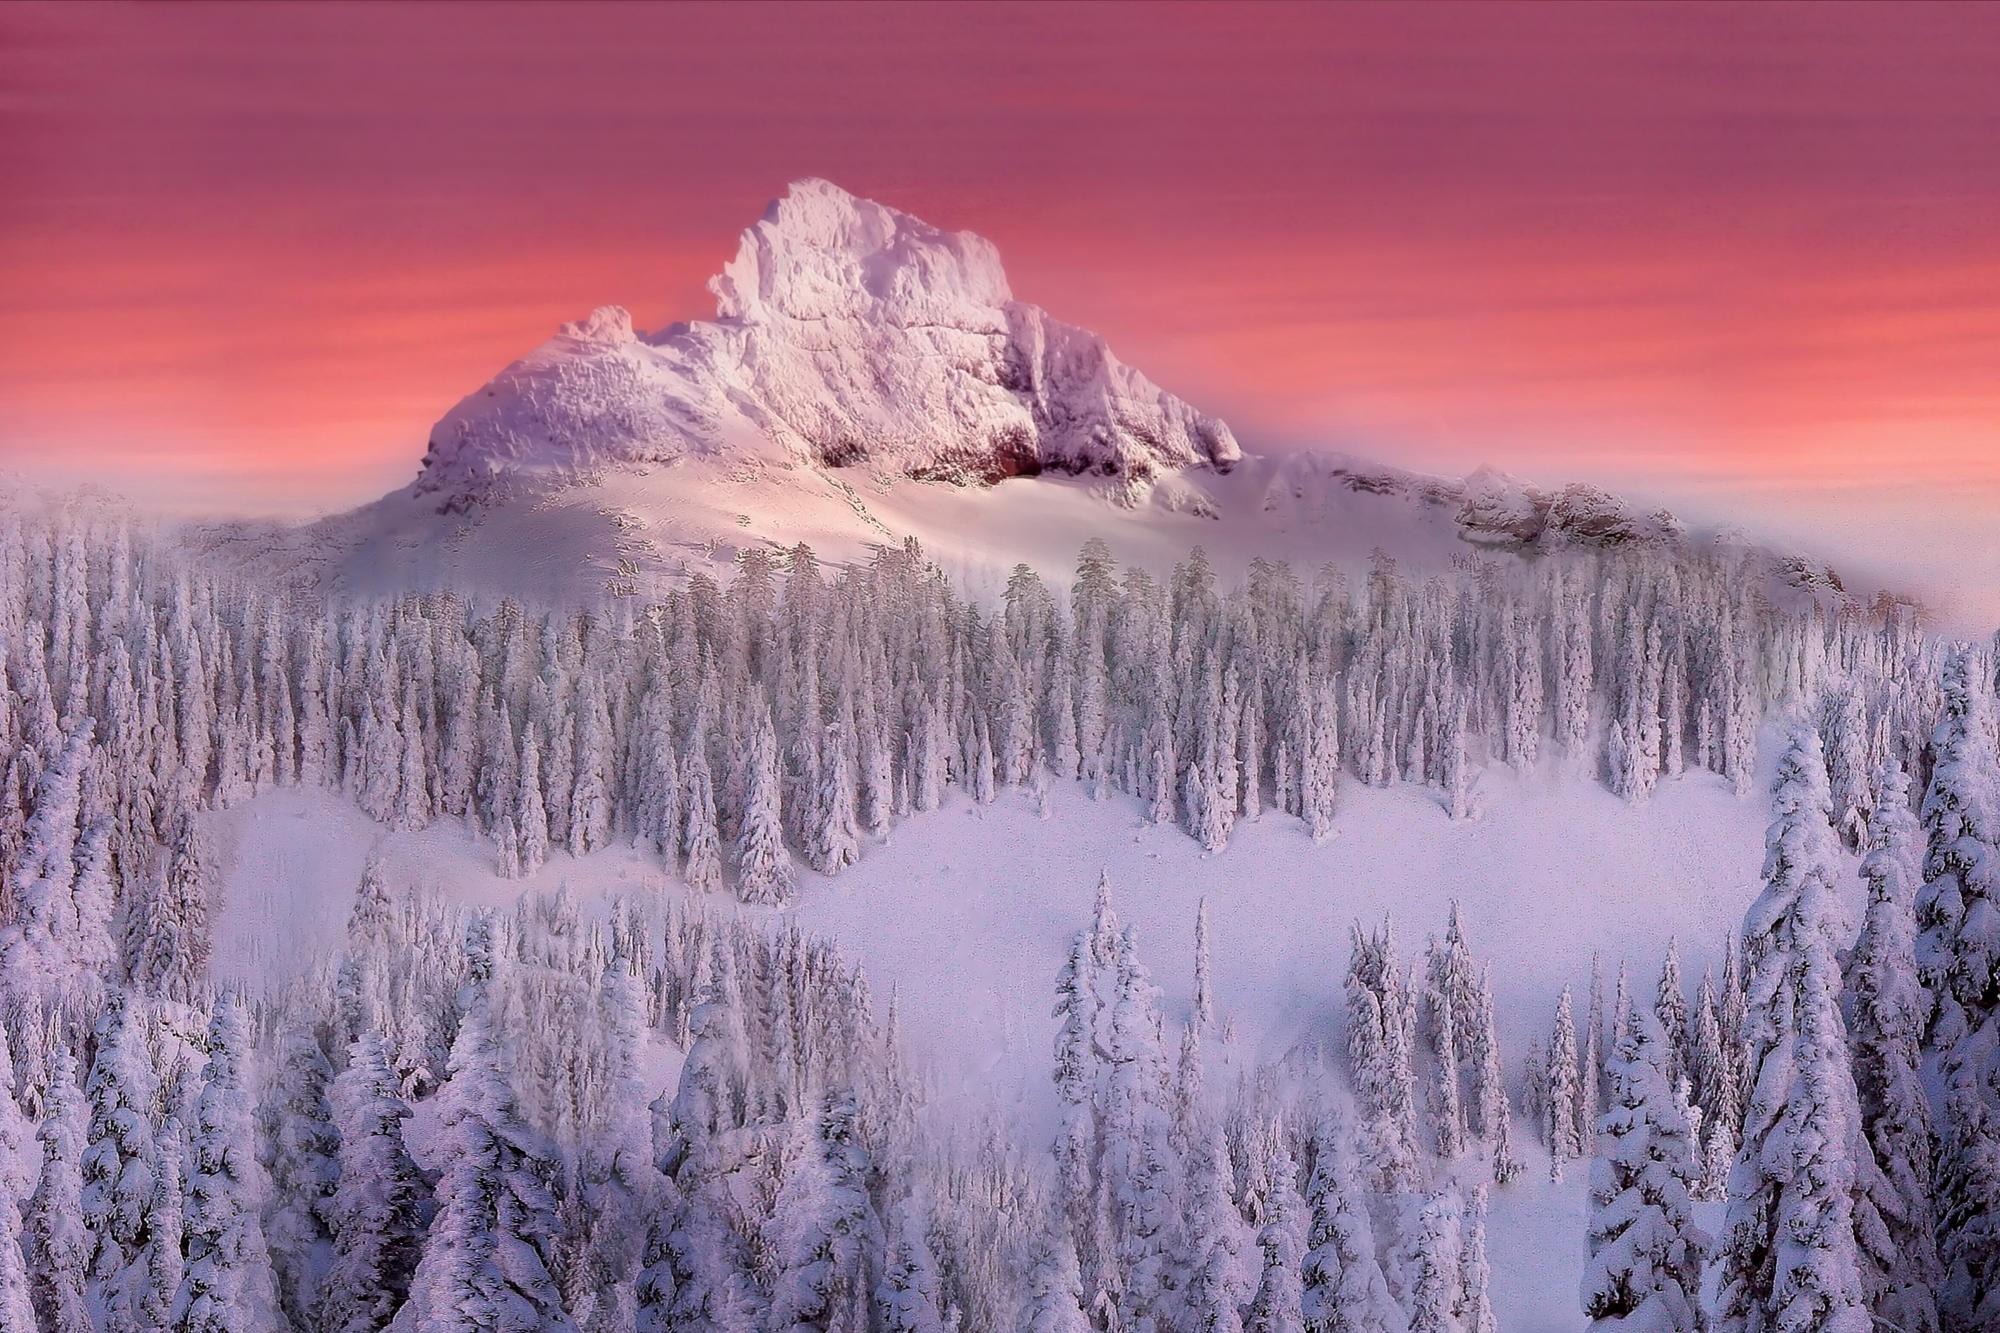 природа скалы деревья горы снег зима nature rock trees mountains snow winter  № 455824 бесплатно